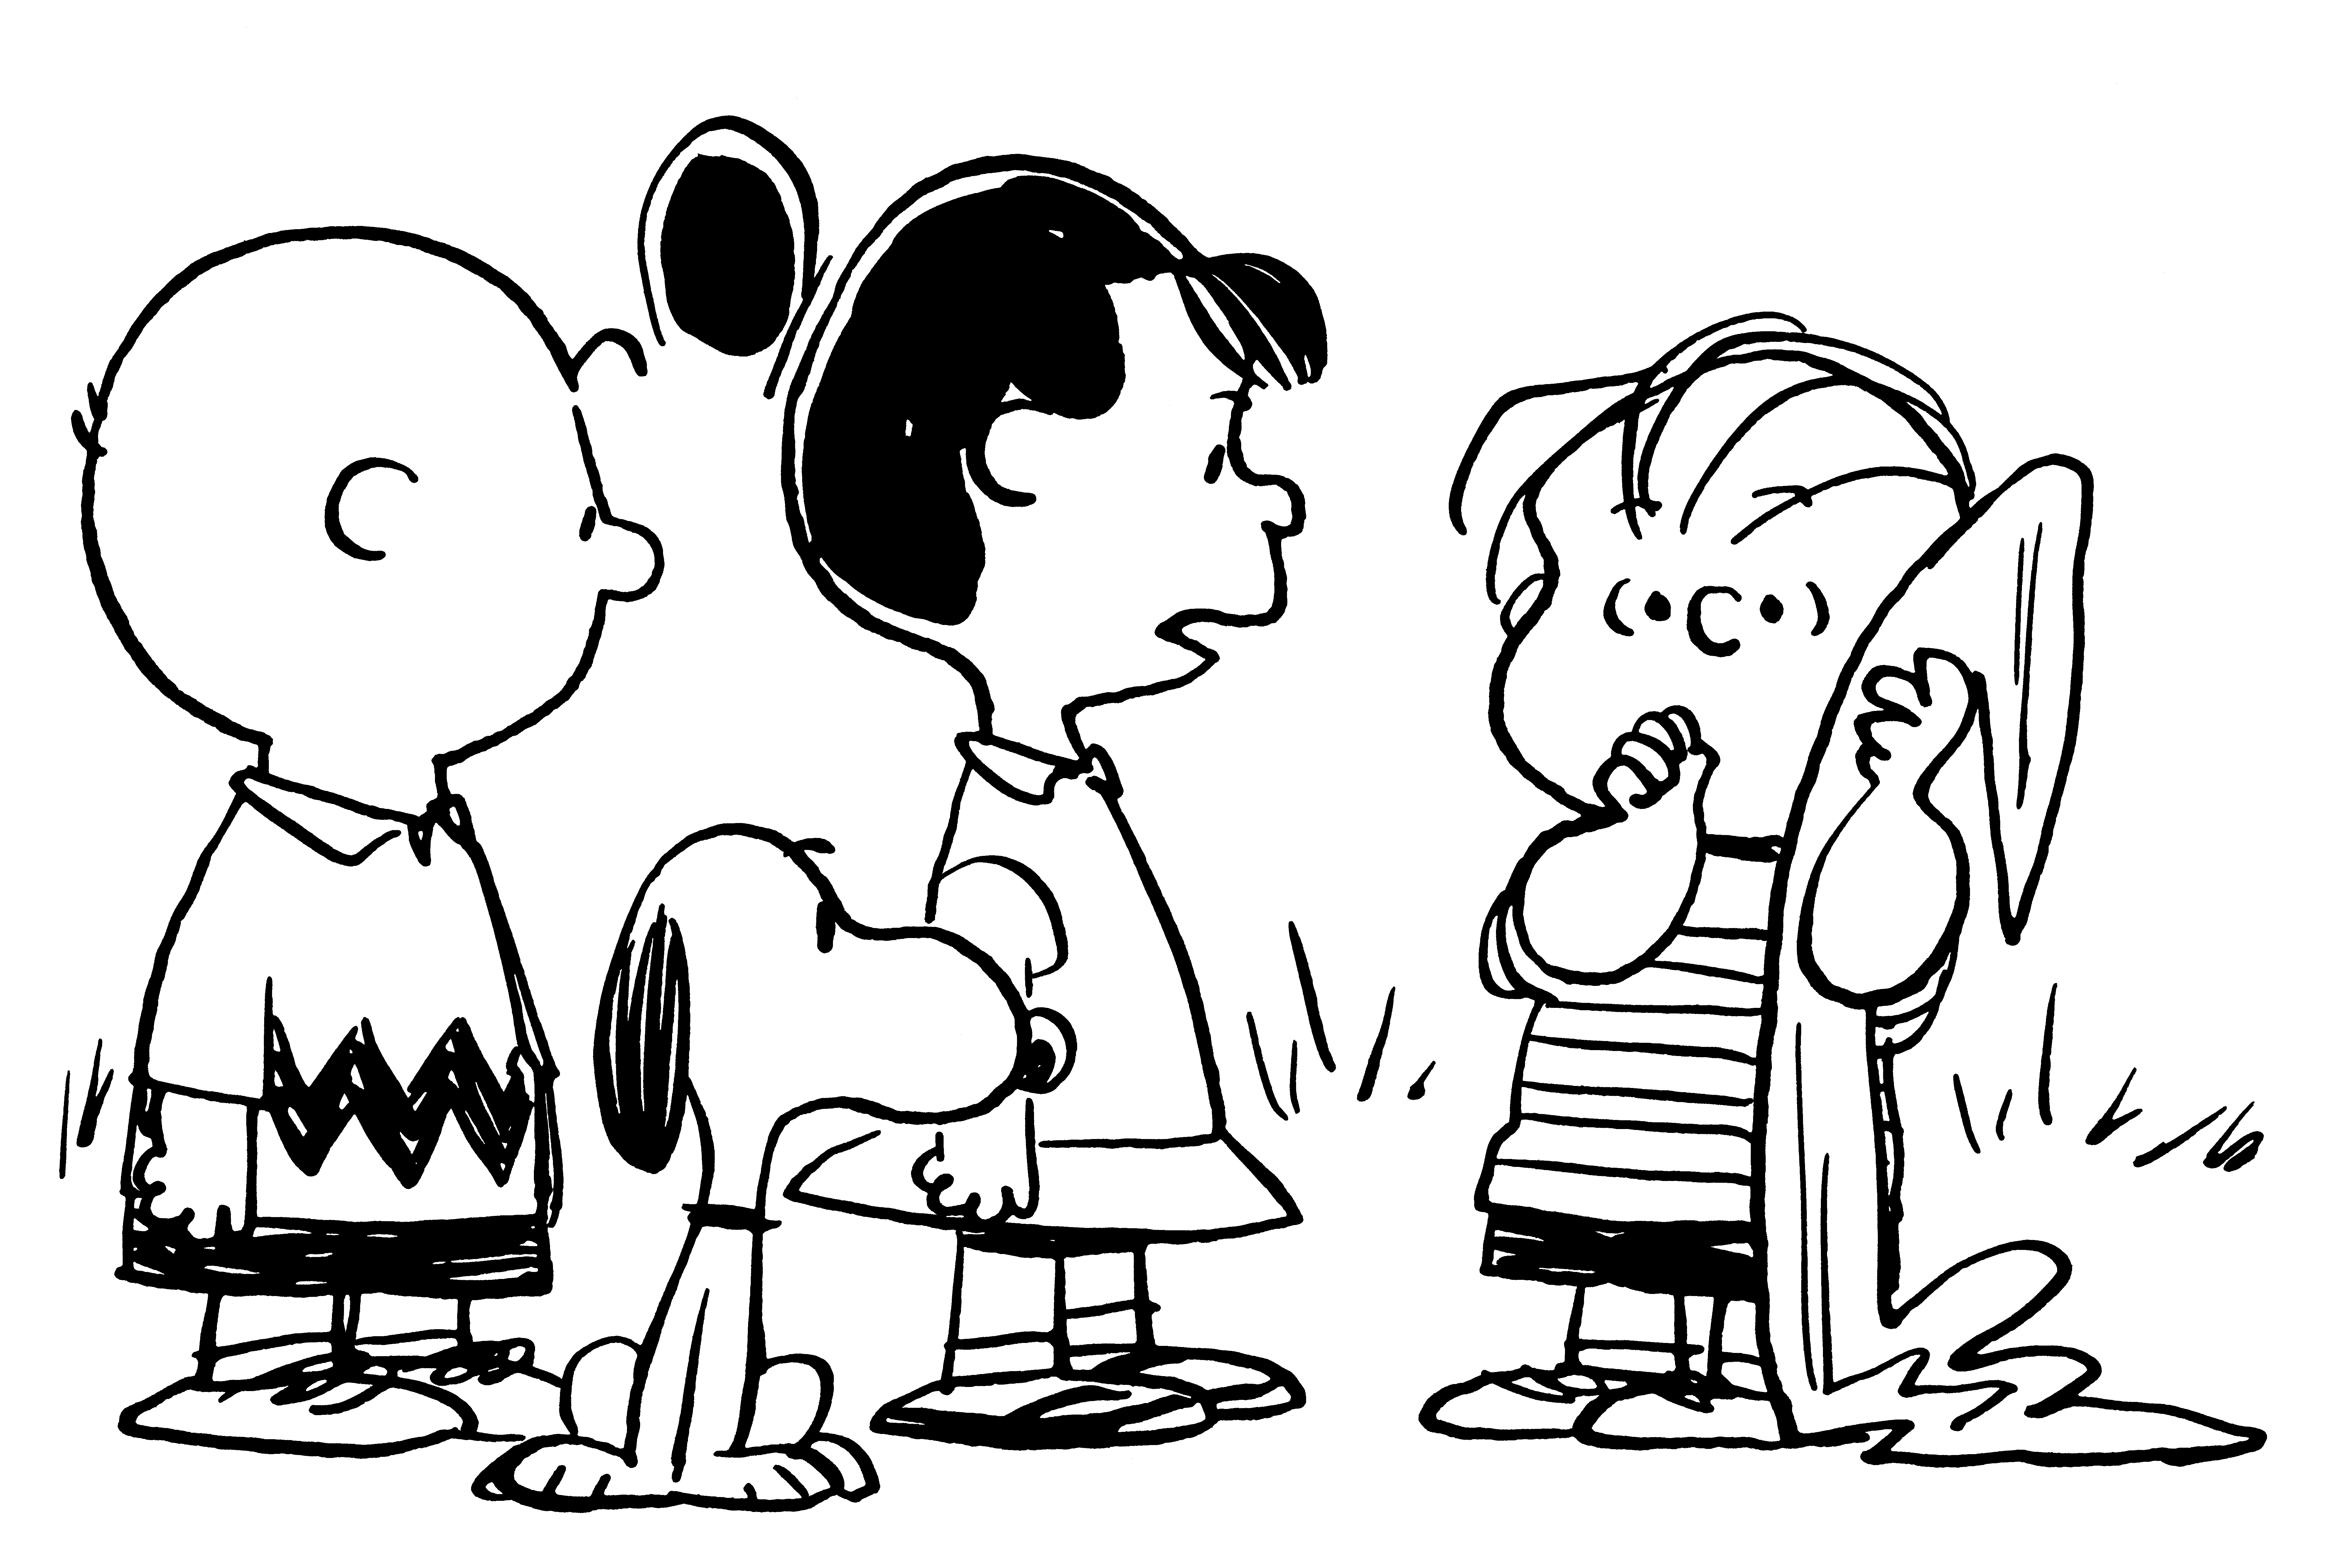 Peanuts Comic 20 Themes that Make Peanuts Timeless   Threadless